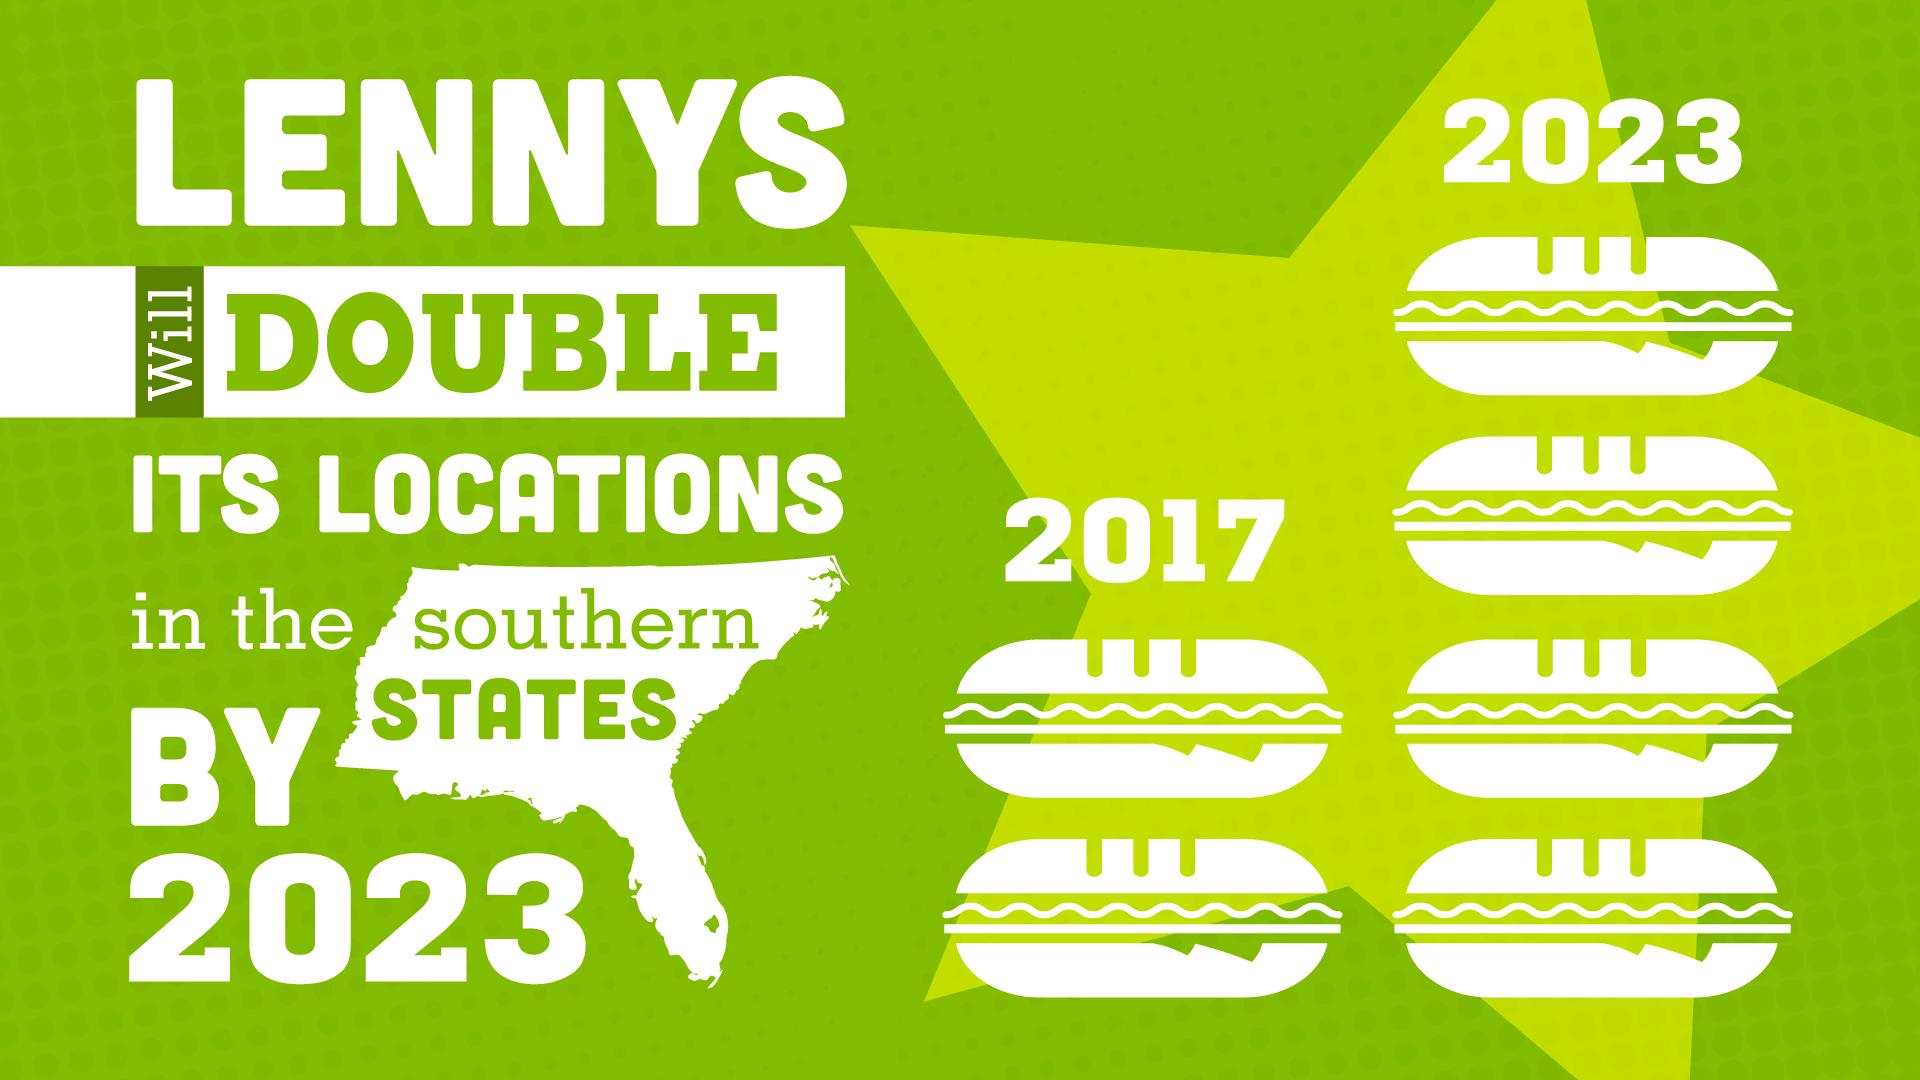 lennys sandwhich franchise